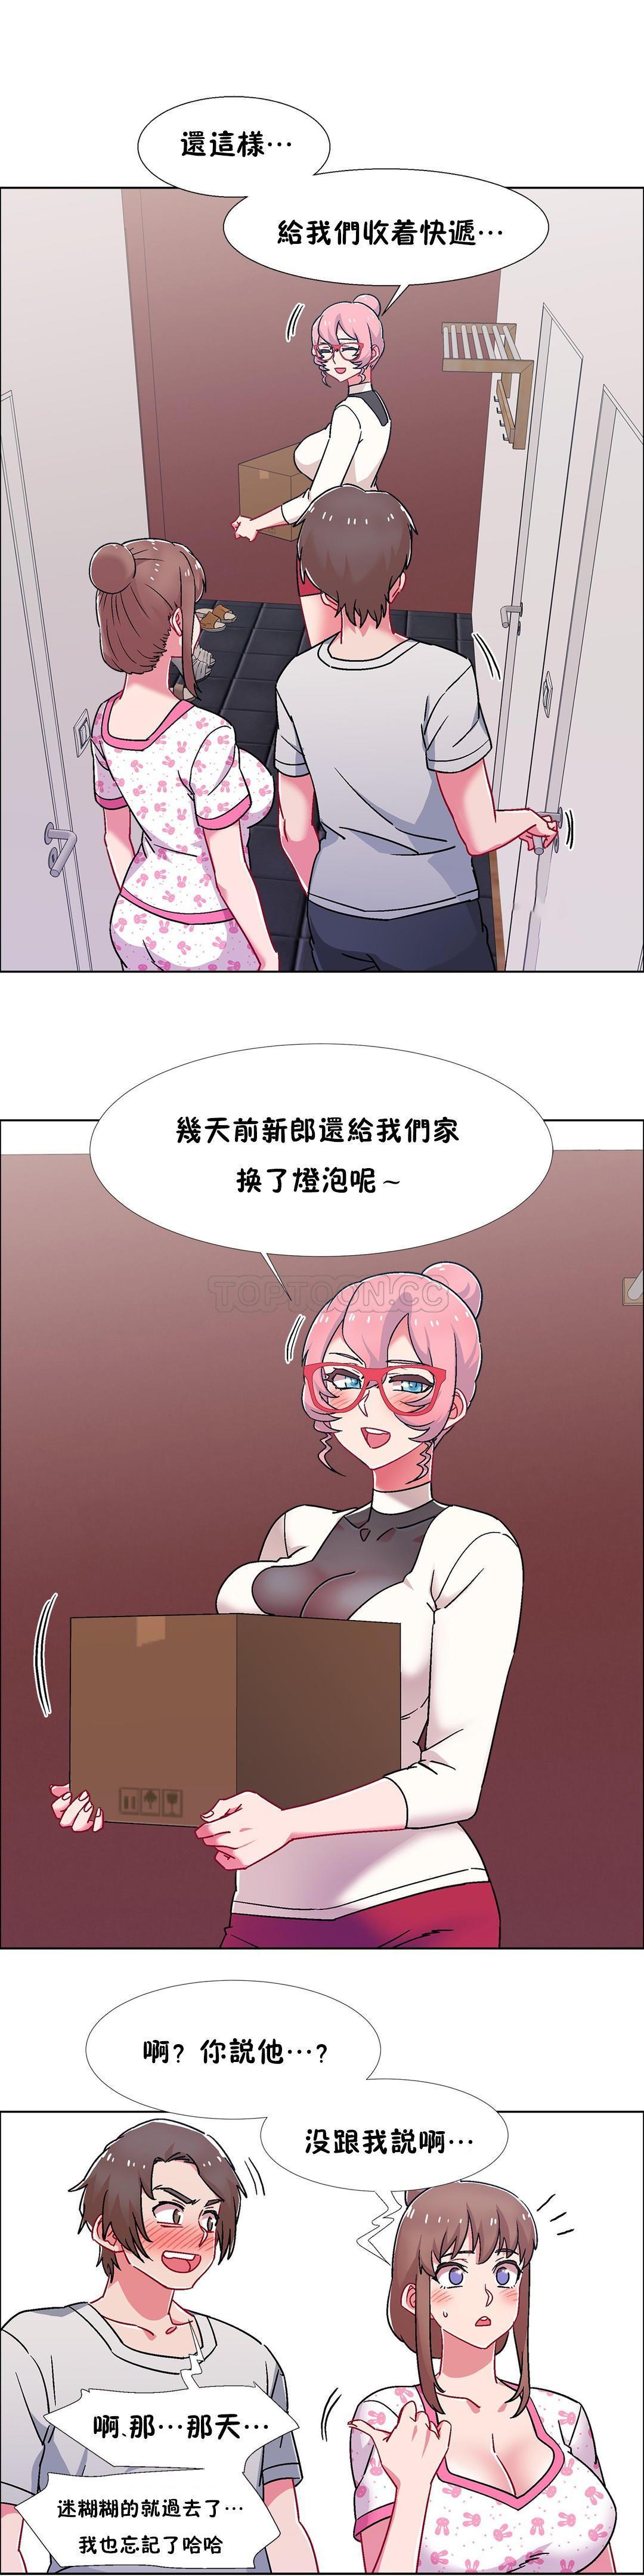 [Studio Wannabe] Rental Girls | 出租女郎 Ch. 33-58 [Chinese]  第二季 完结 499